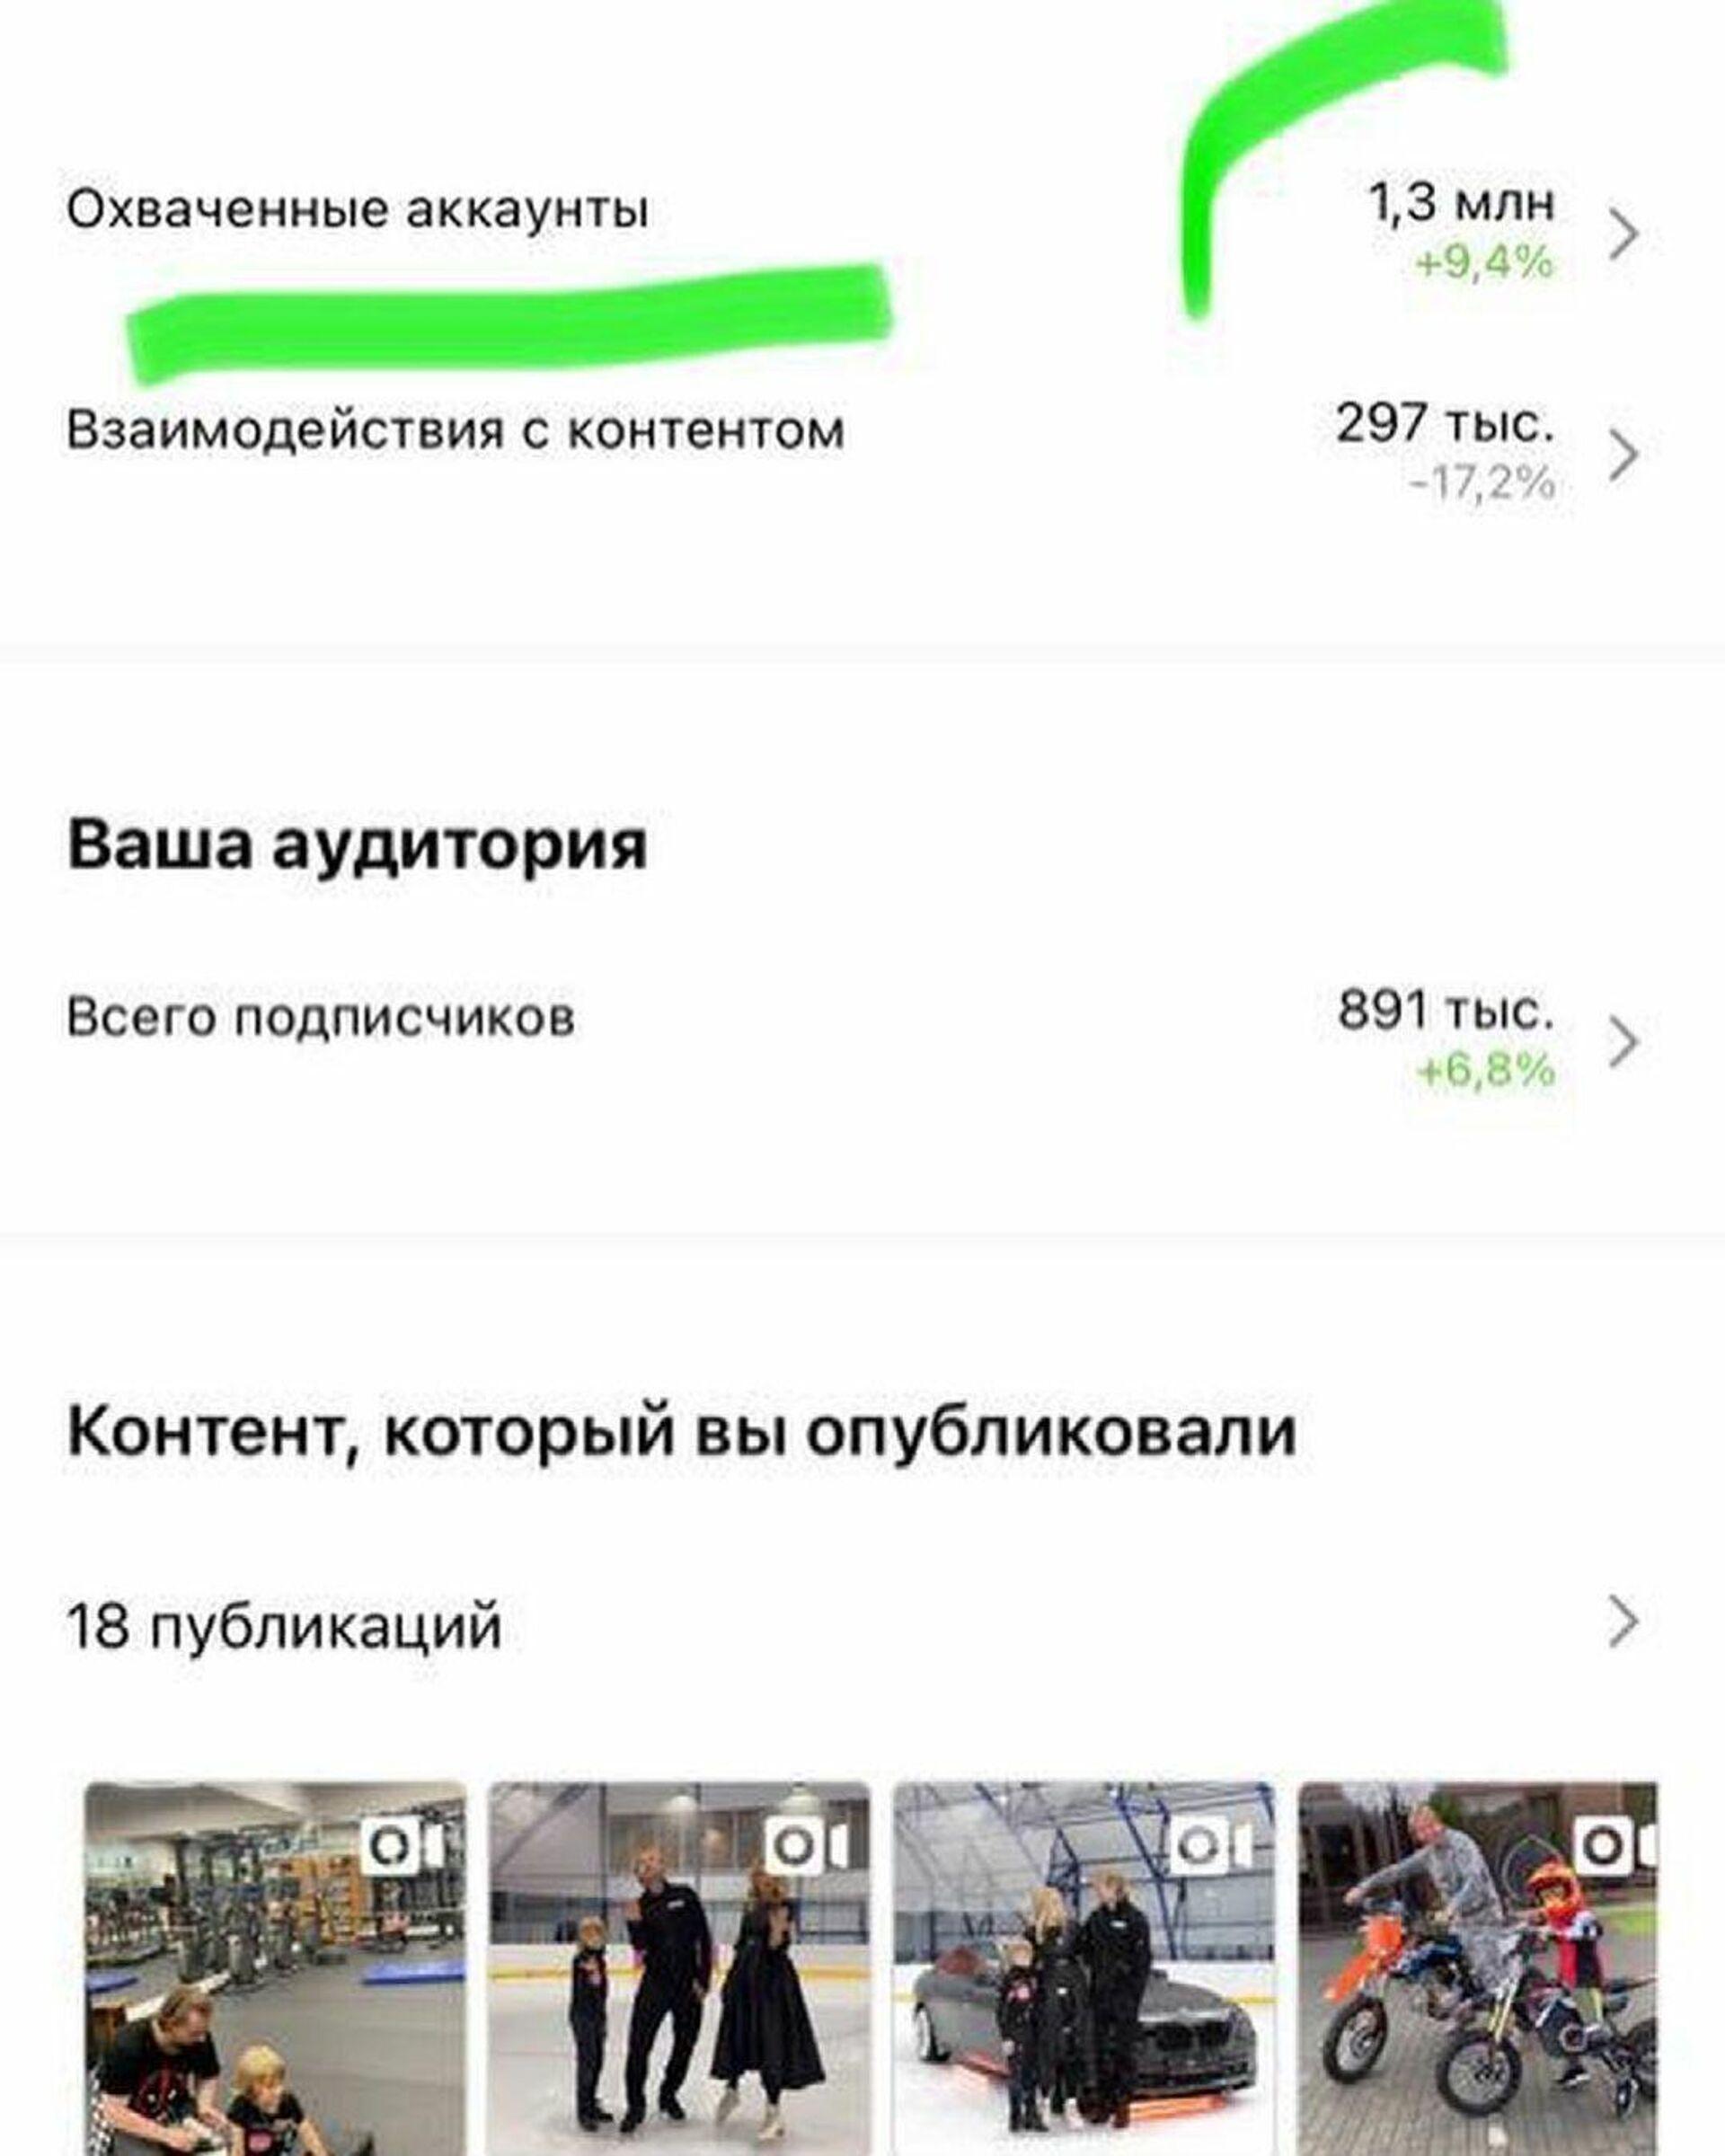 Охват аудитории аккаунта Александра Плющенко в Instagram. - РИА Новости, 1920, 14.06.2021